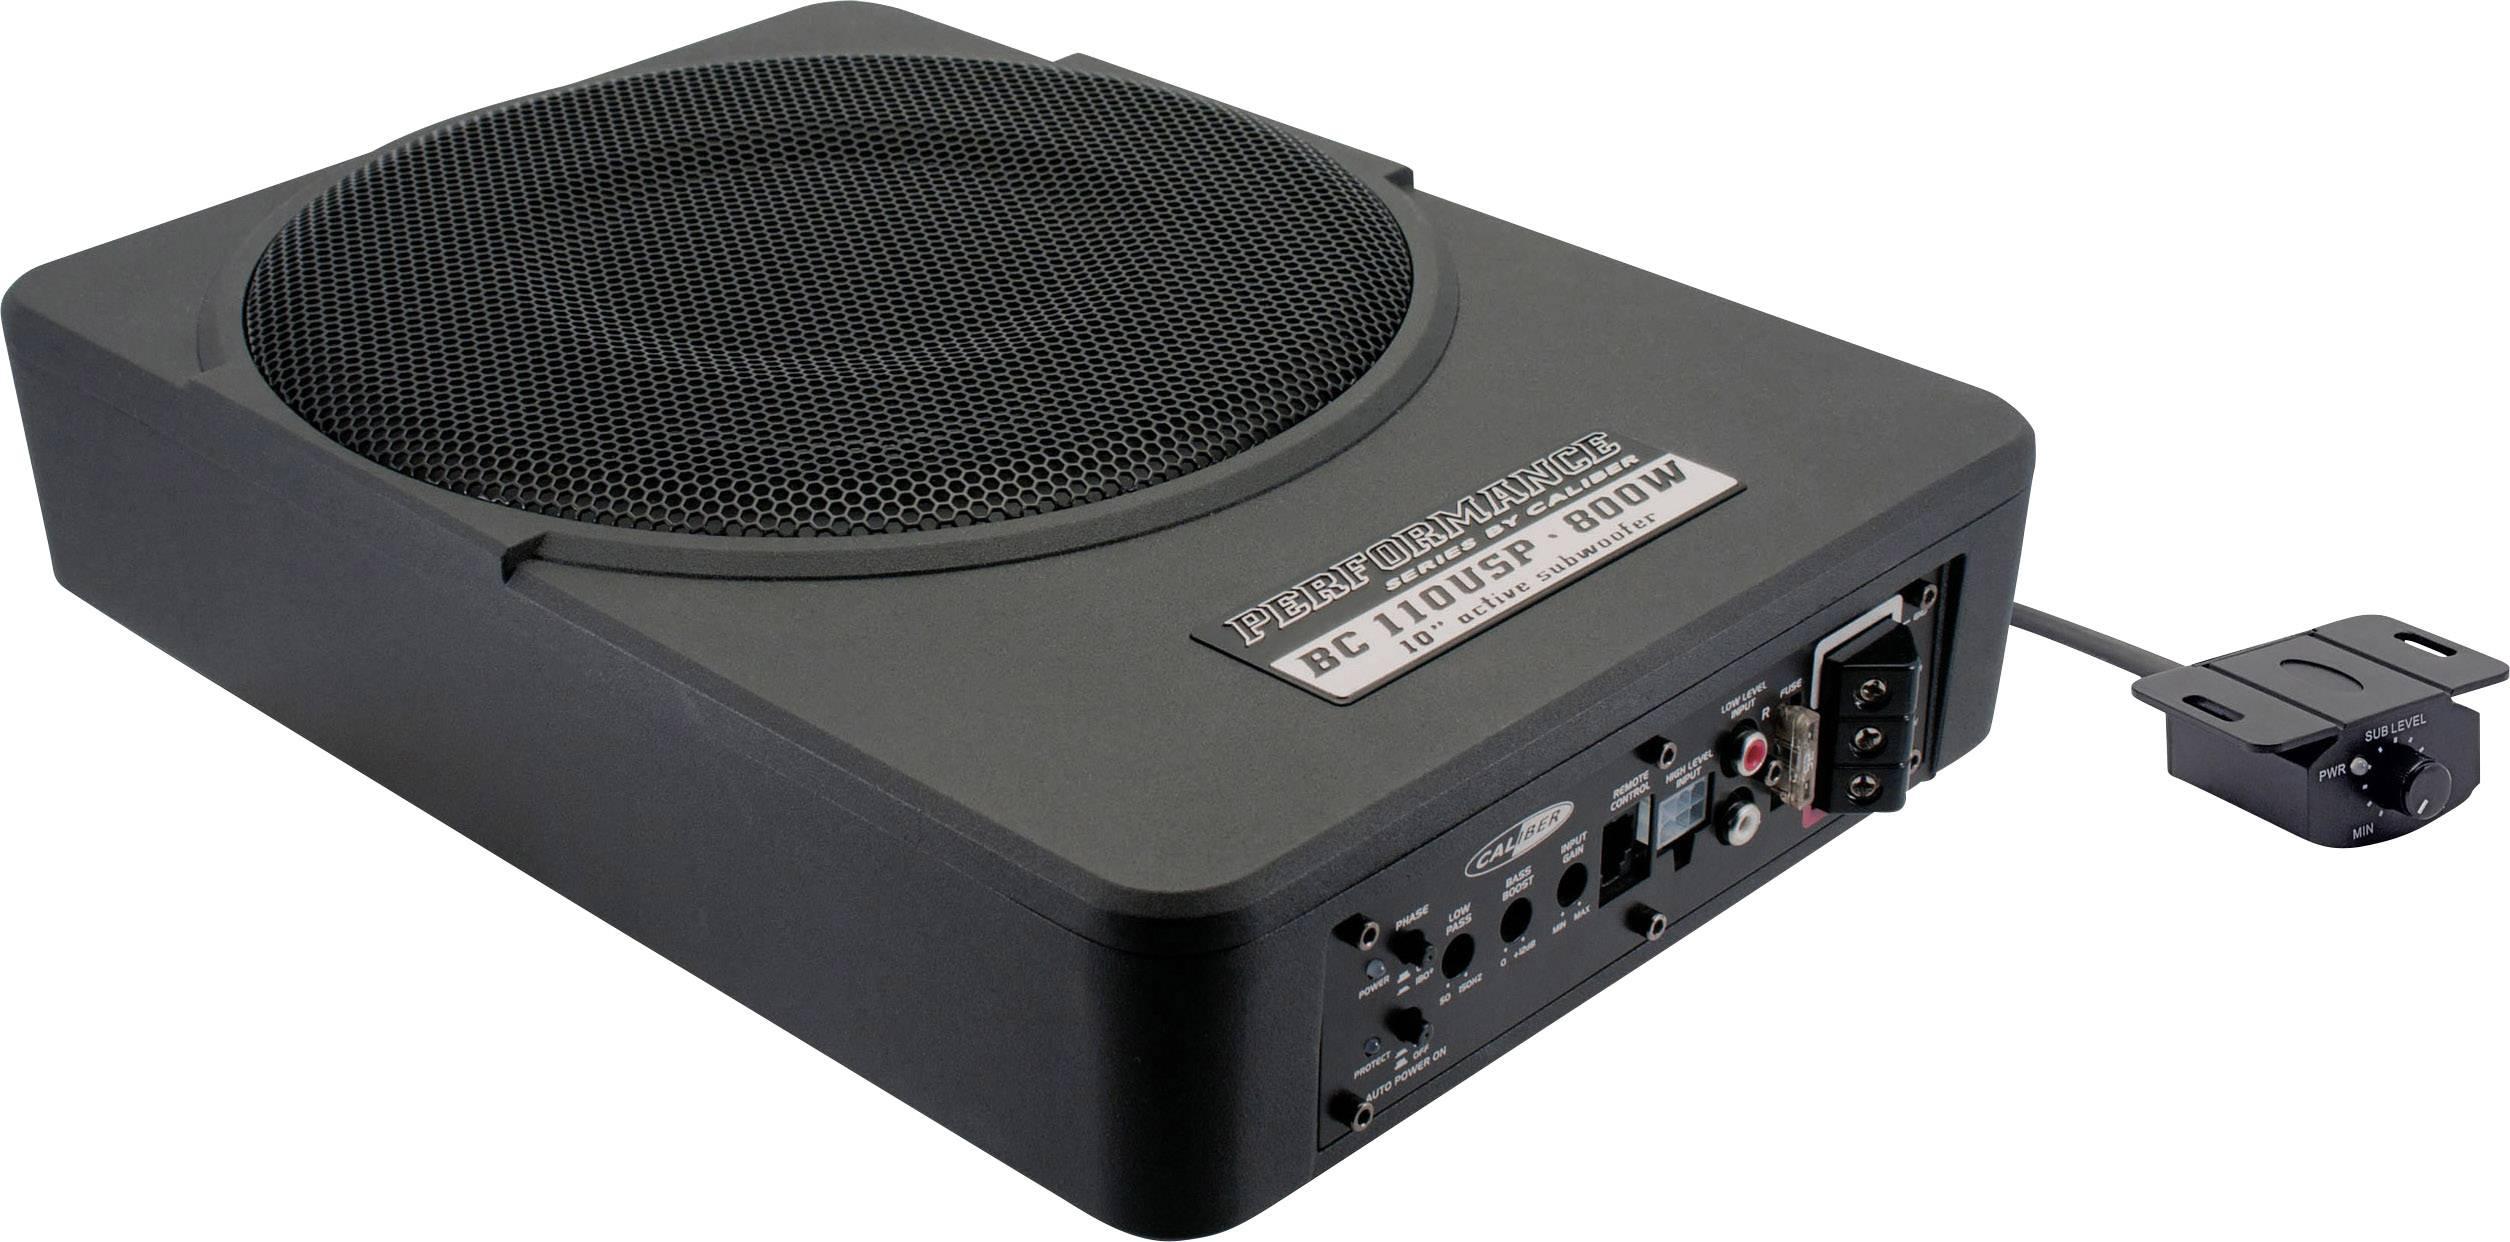 caliber audio technology bc110usp auto subwoofer aktiv 800 w kaufen. Black Bedroom Furniture Sets. Home Design Ideas